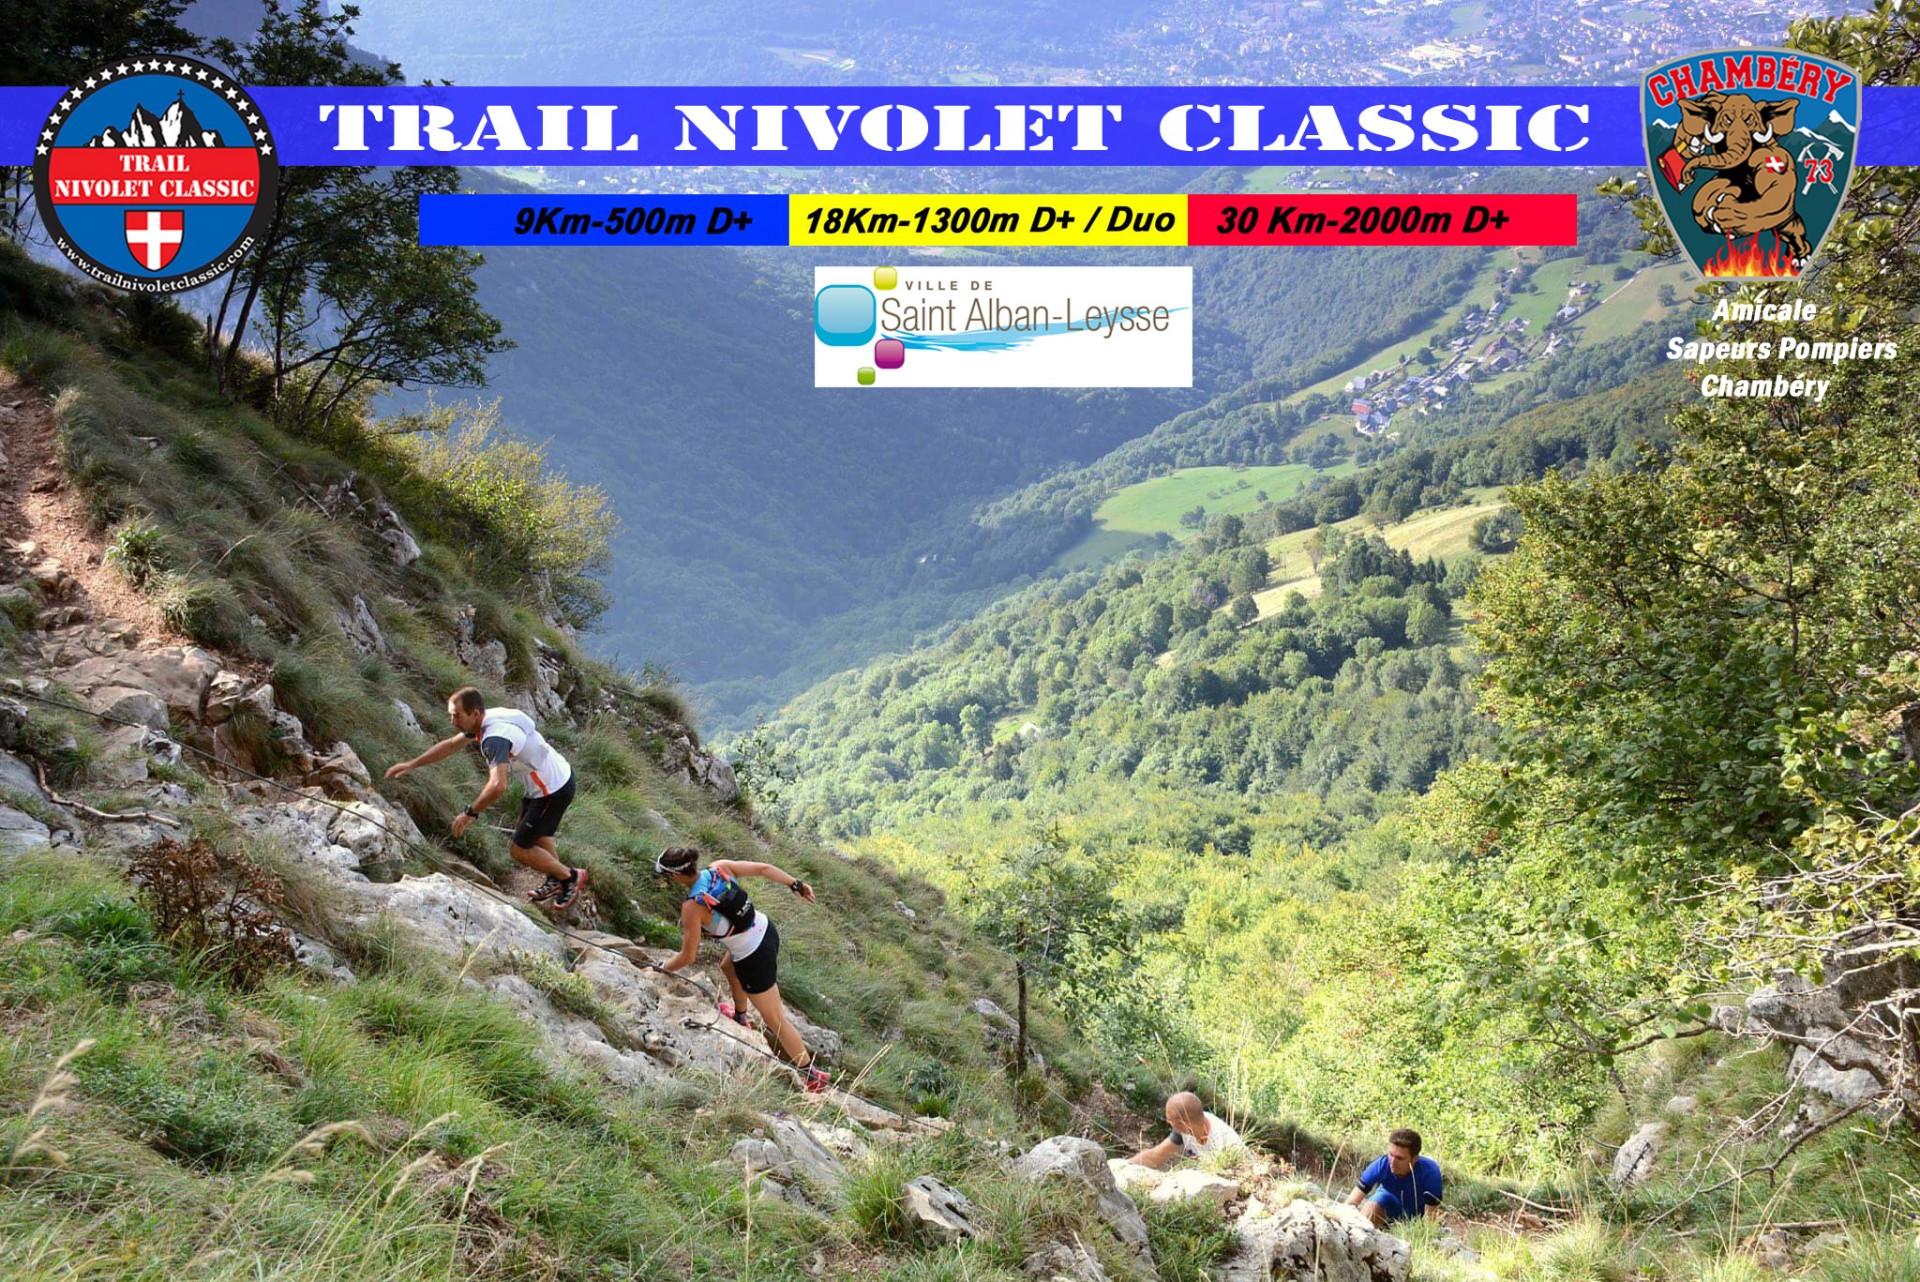 trail_nivolet_classic_visuel_27179_copie.jpg